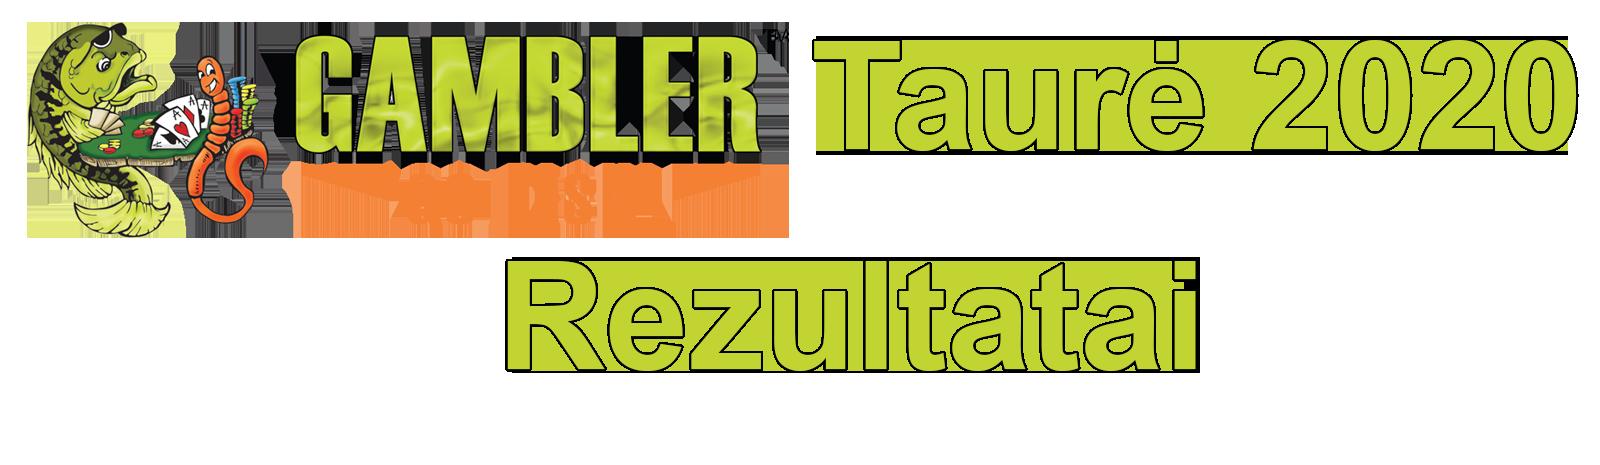 Gambler Taurė 2020 - Rezultatai